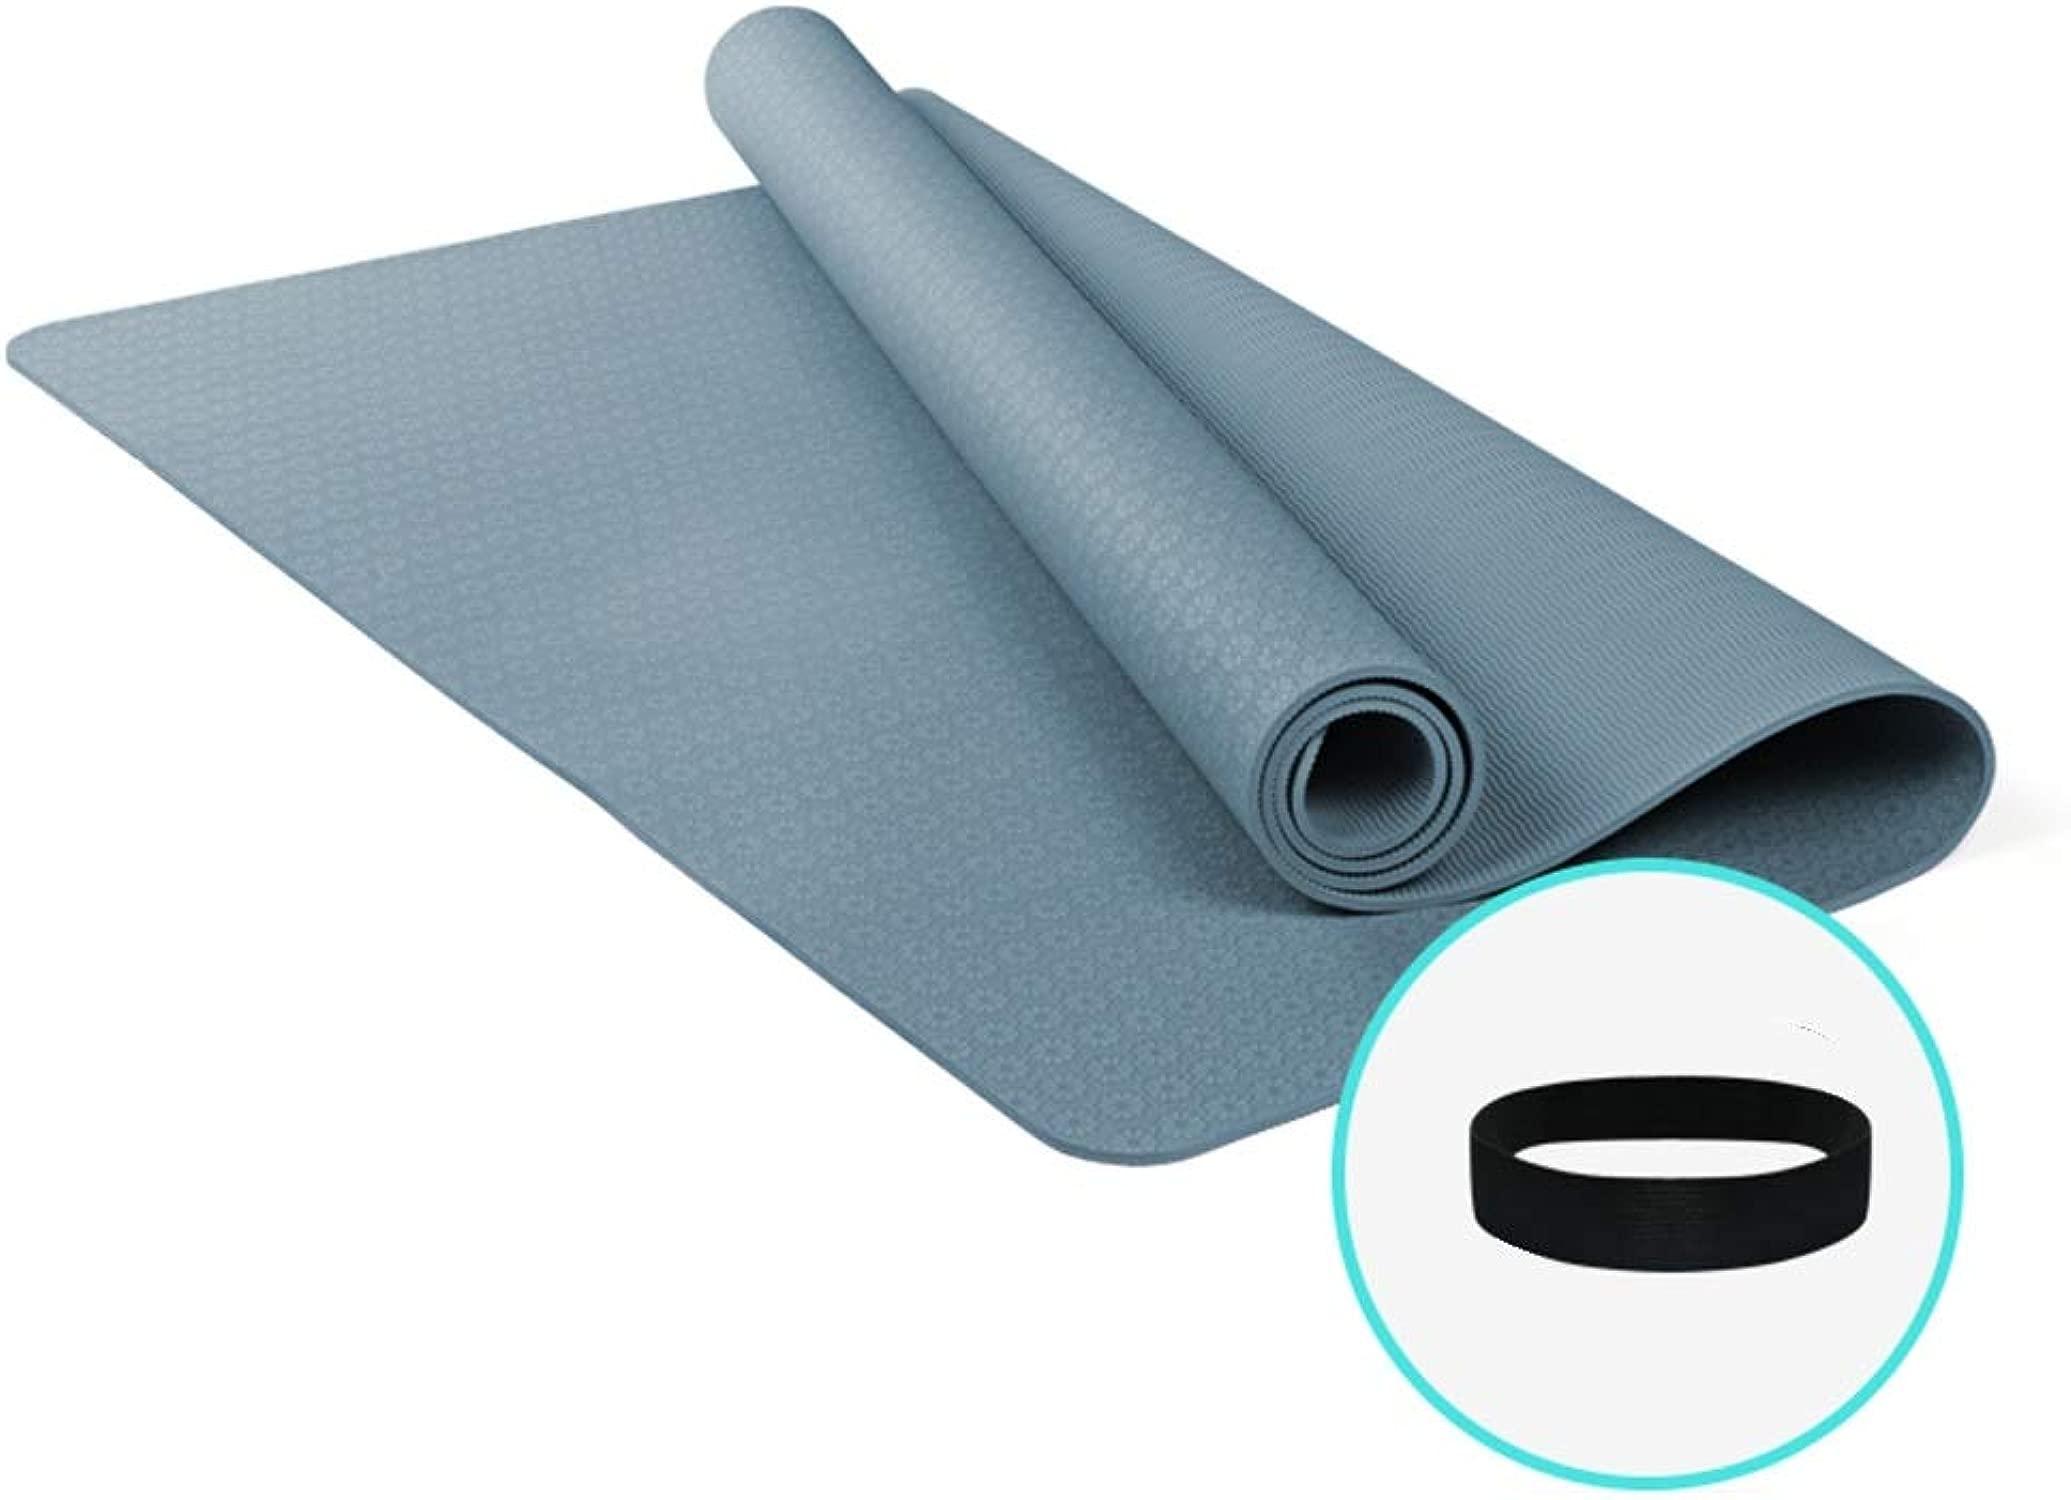 TYCXYD Fitness-Matte Yoga-Matte Superdick Anti-Rutsch-Bügel-Bügel 185x122cm Yoga Matte (Farbe   G ish Blau)